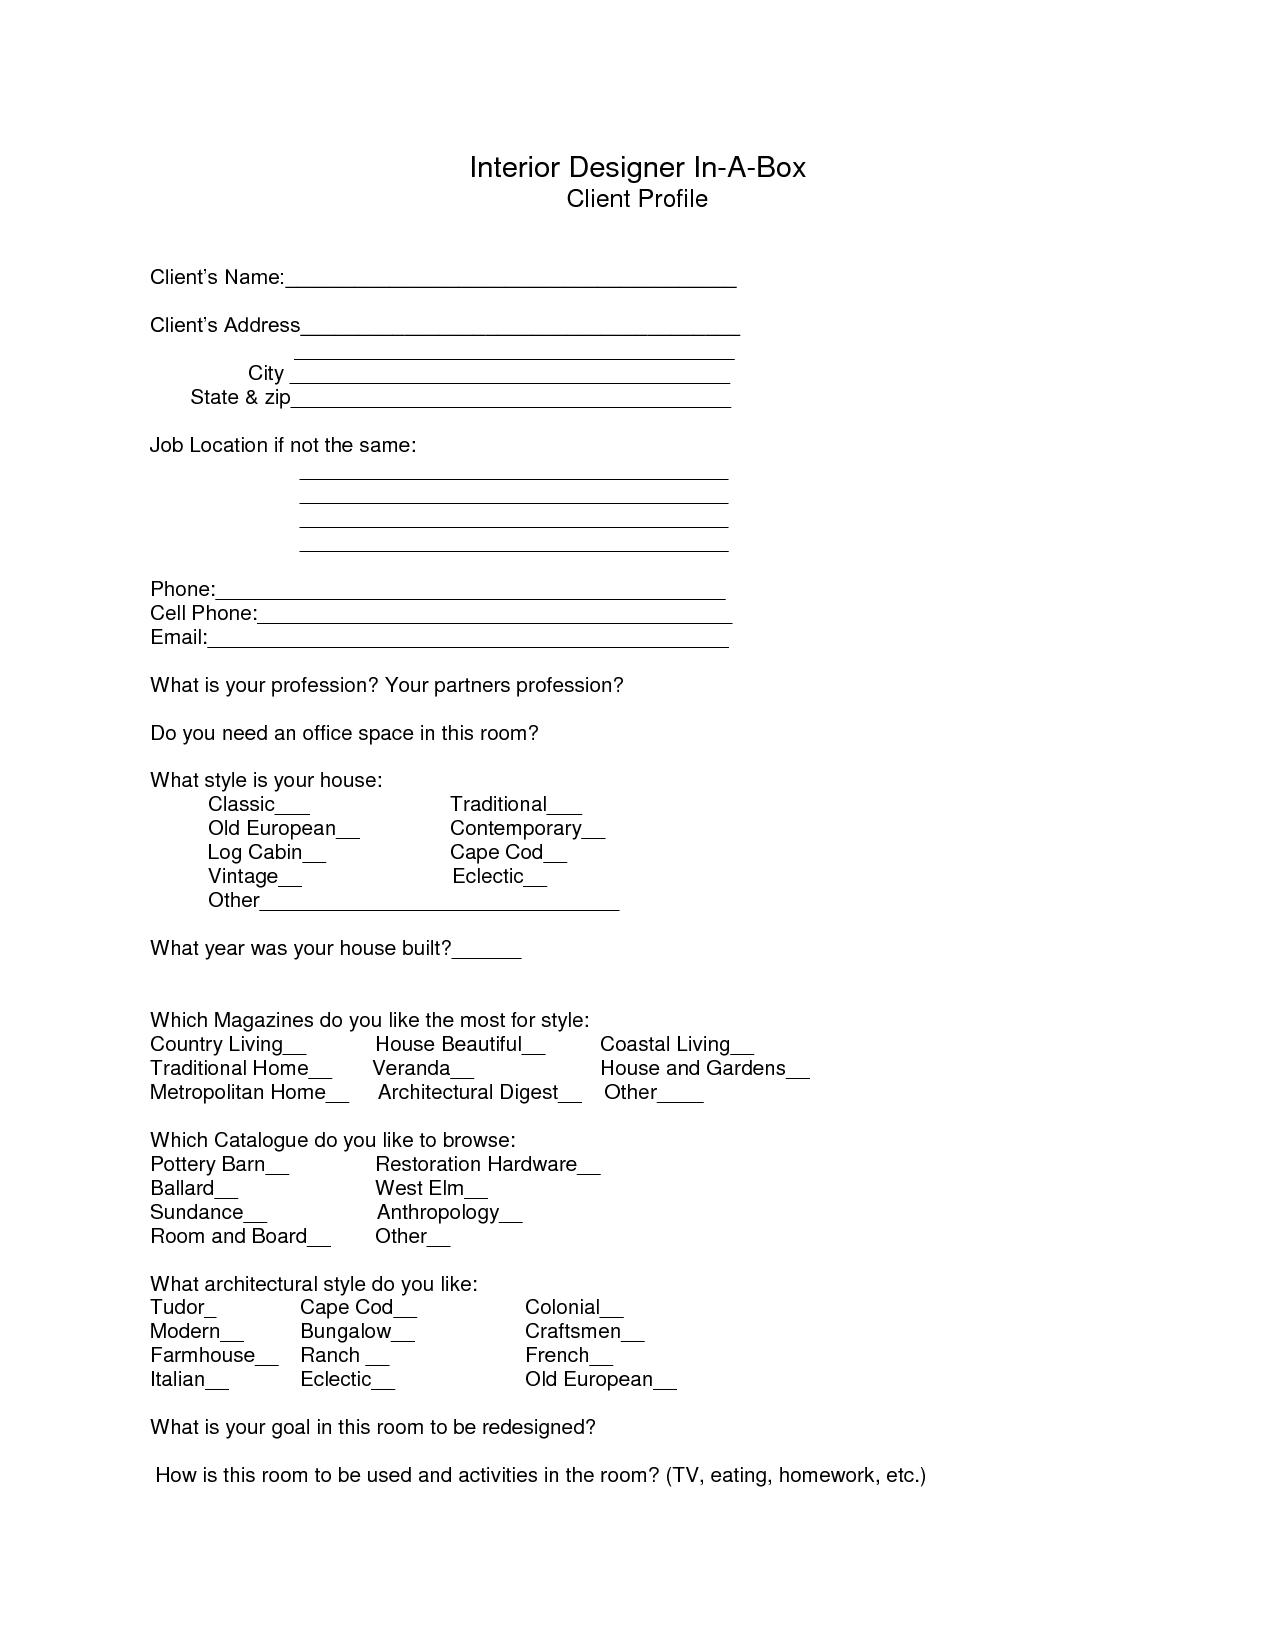 personal trainer client profile template - interior design client profile example